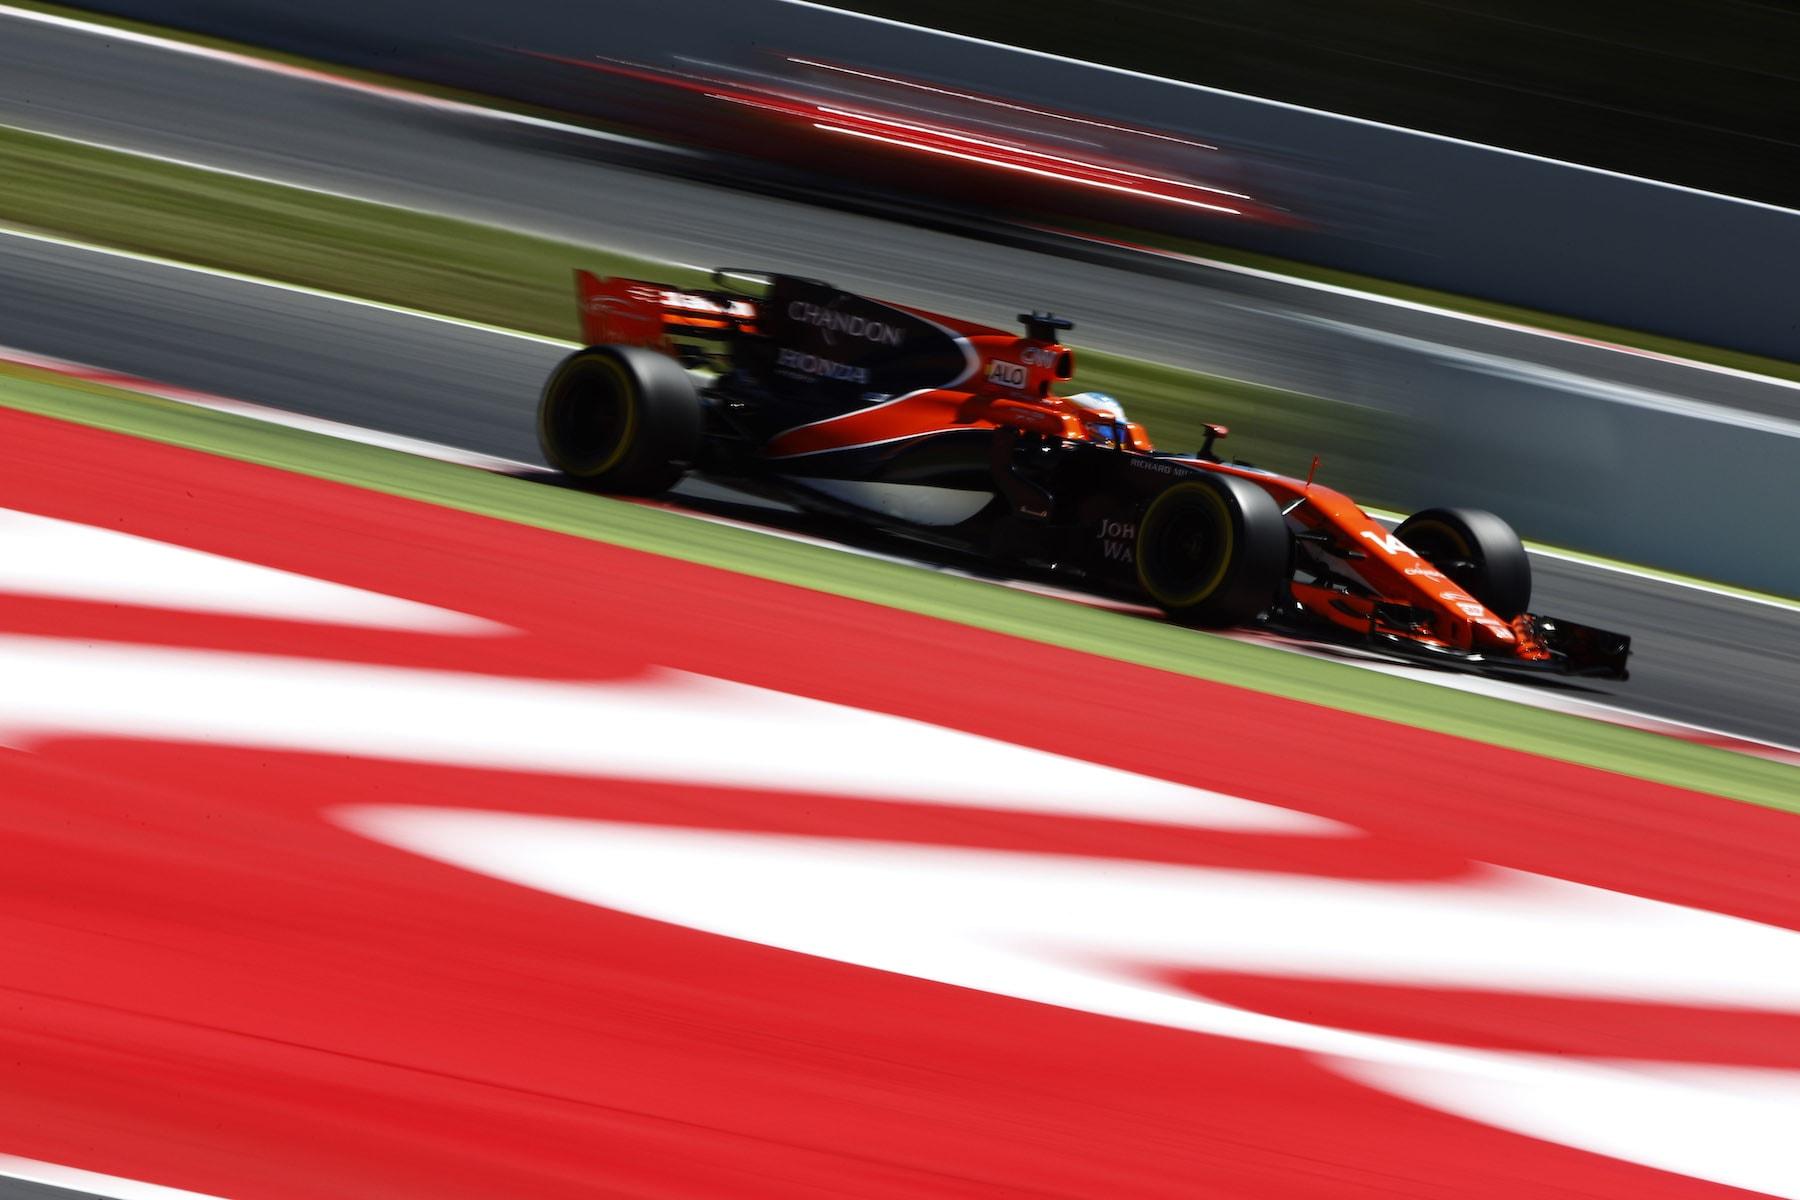 H 2017 Fernando Alonso | McLaren MCL32 | 2017 Spanish GP 1 copy.jpg